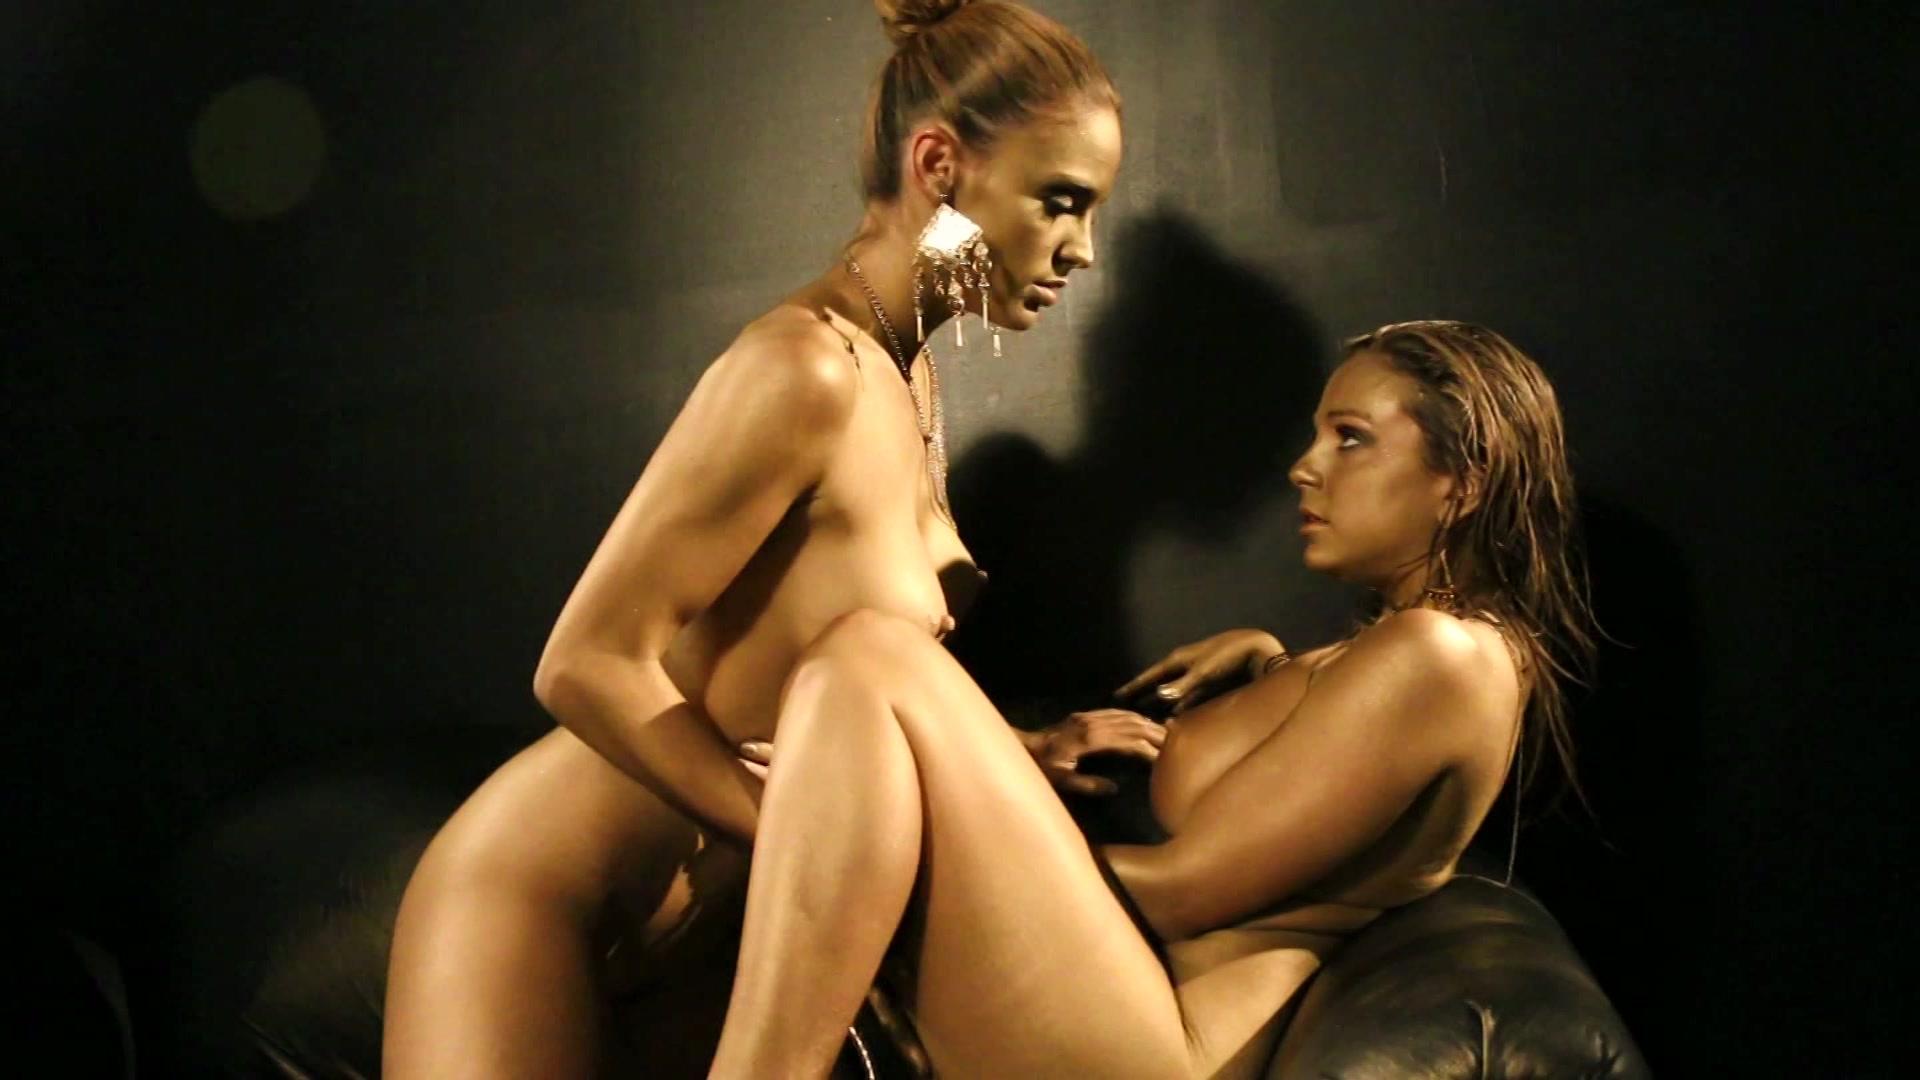 ELENA: Bbw nude bent over ass